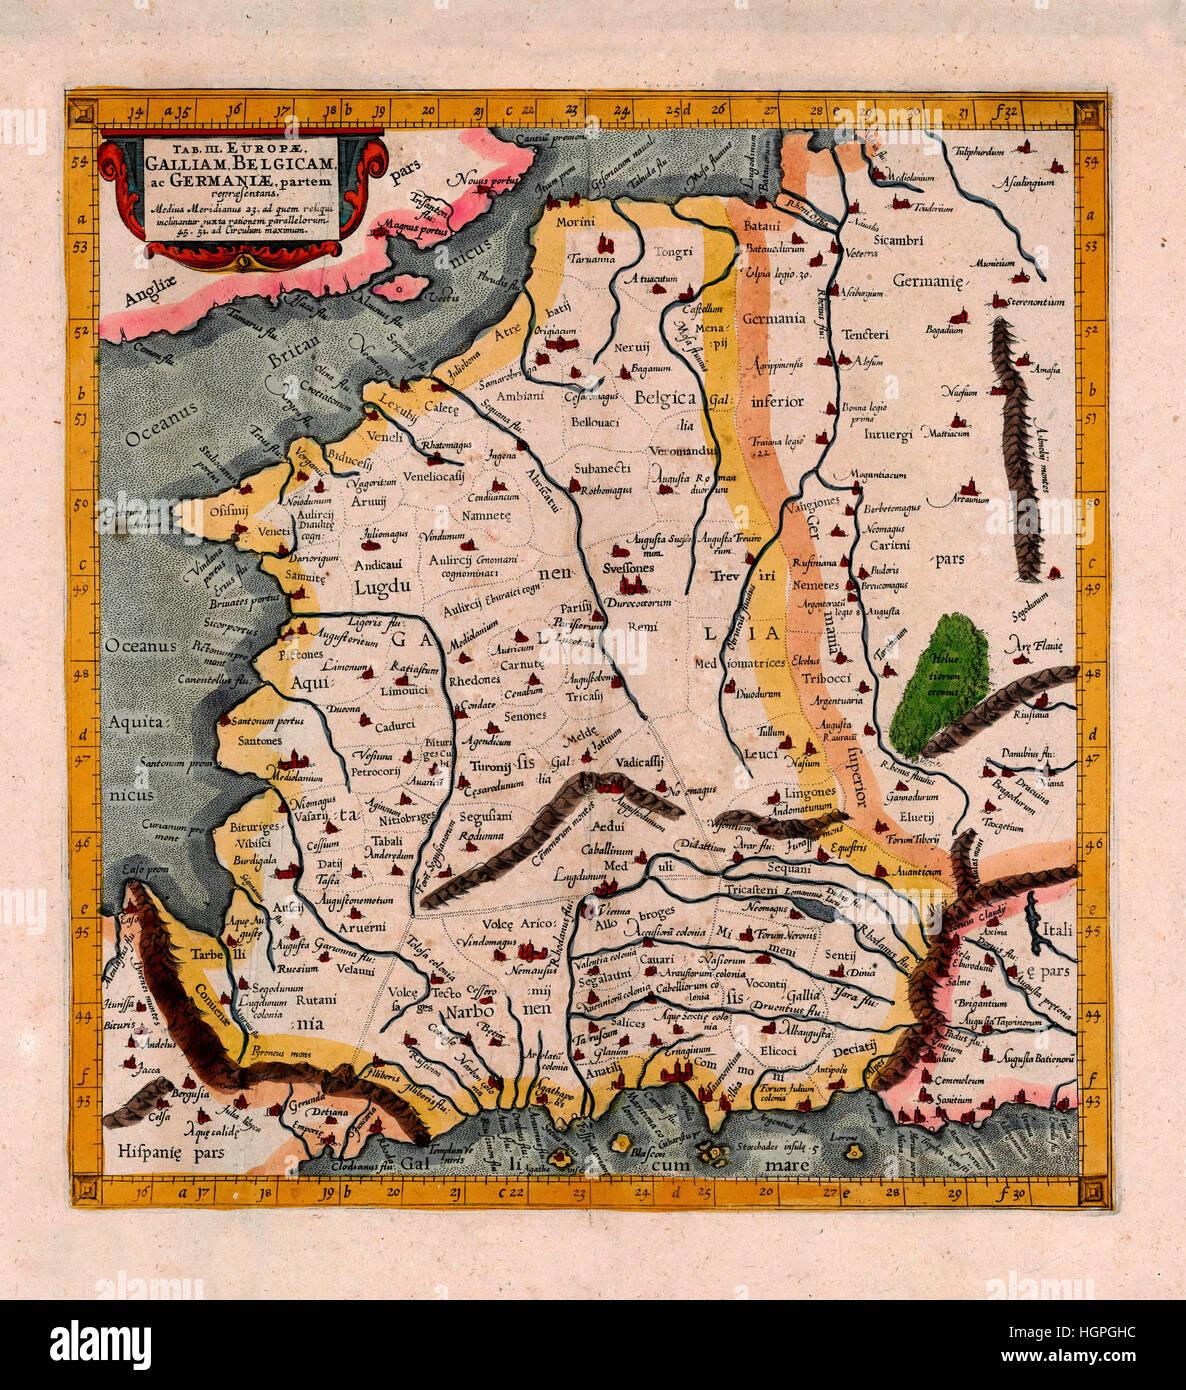 Map Of Belgium 1695 - Stock Image